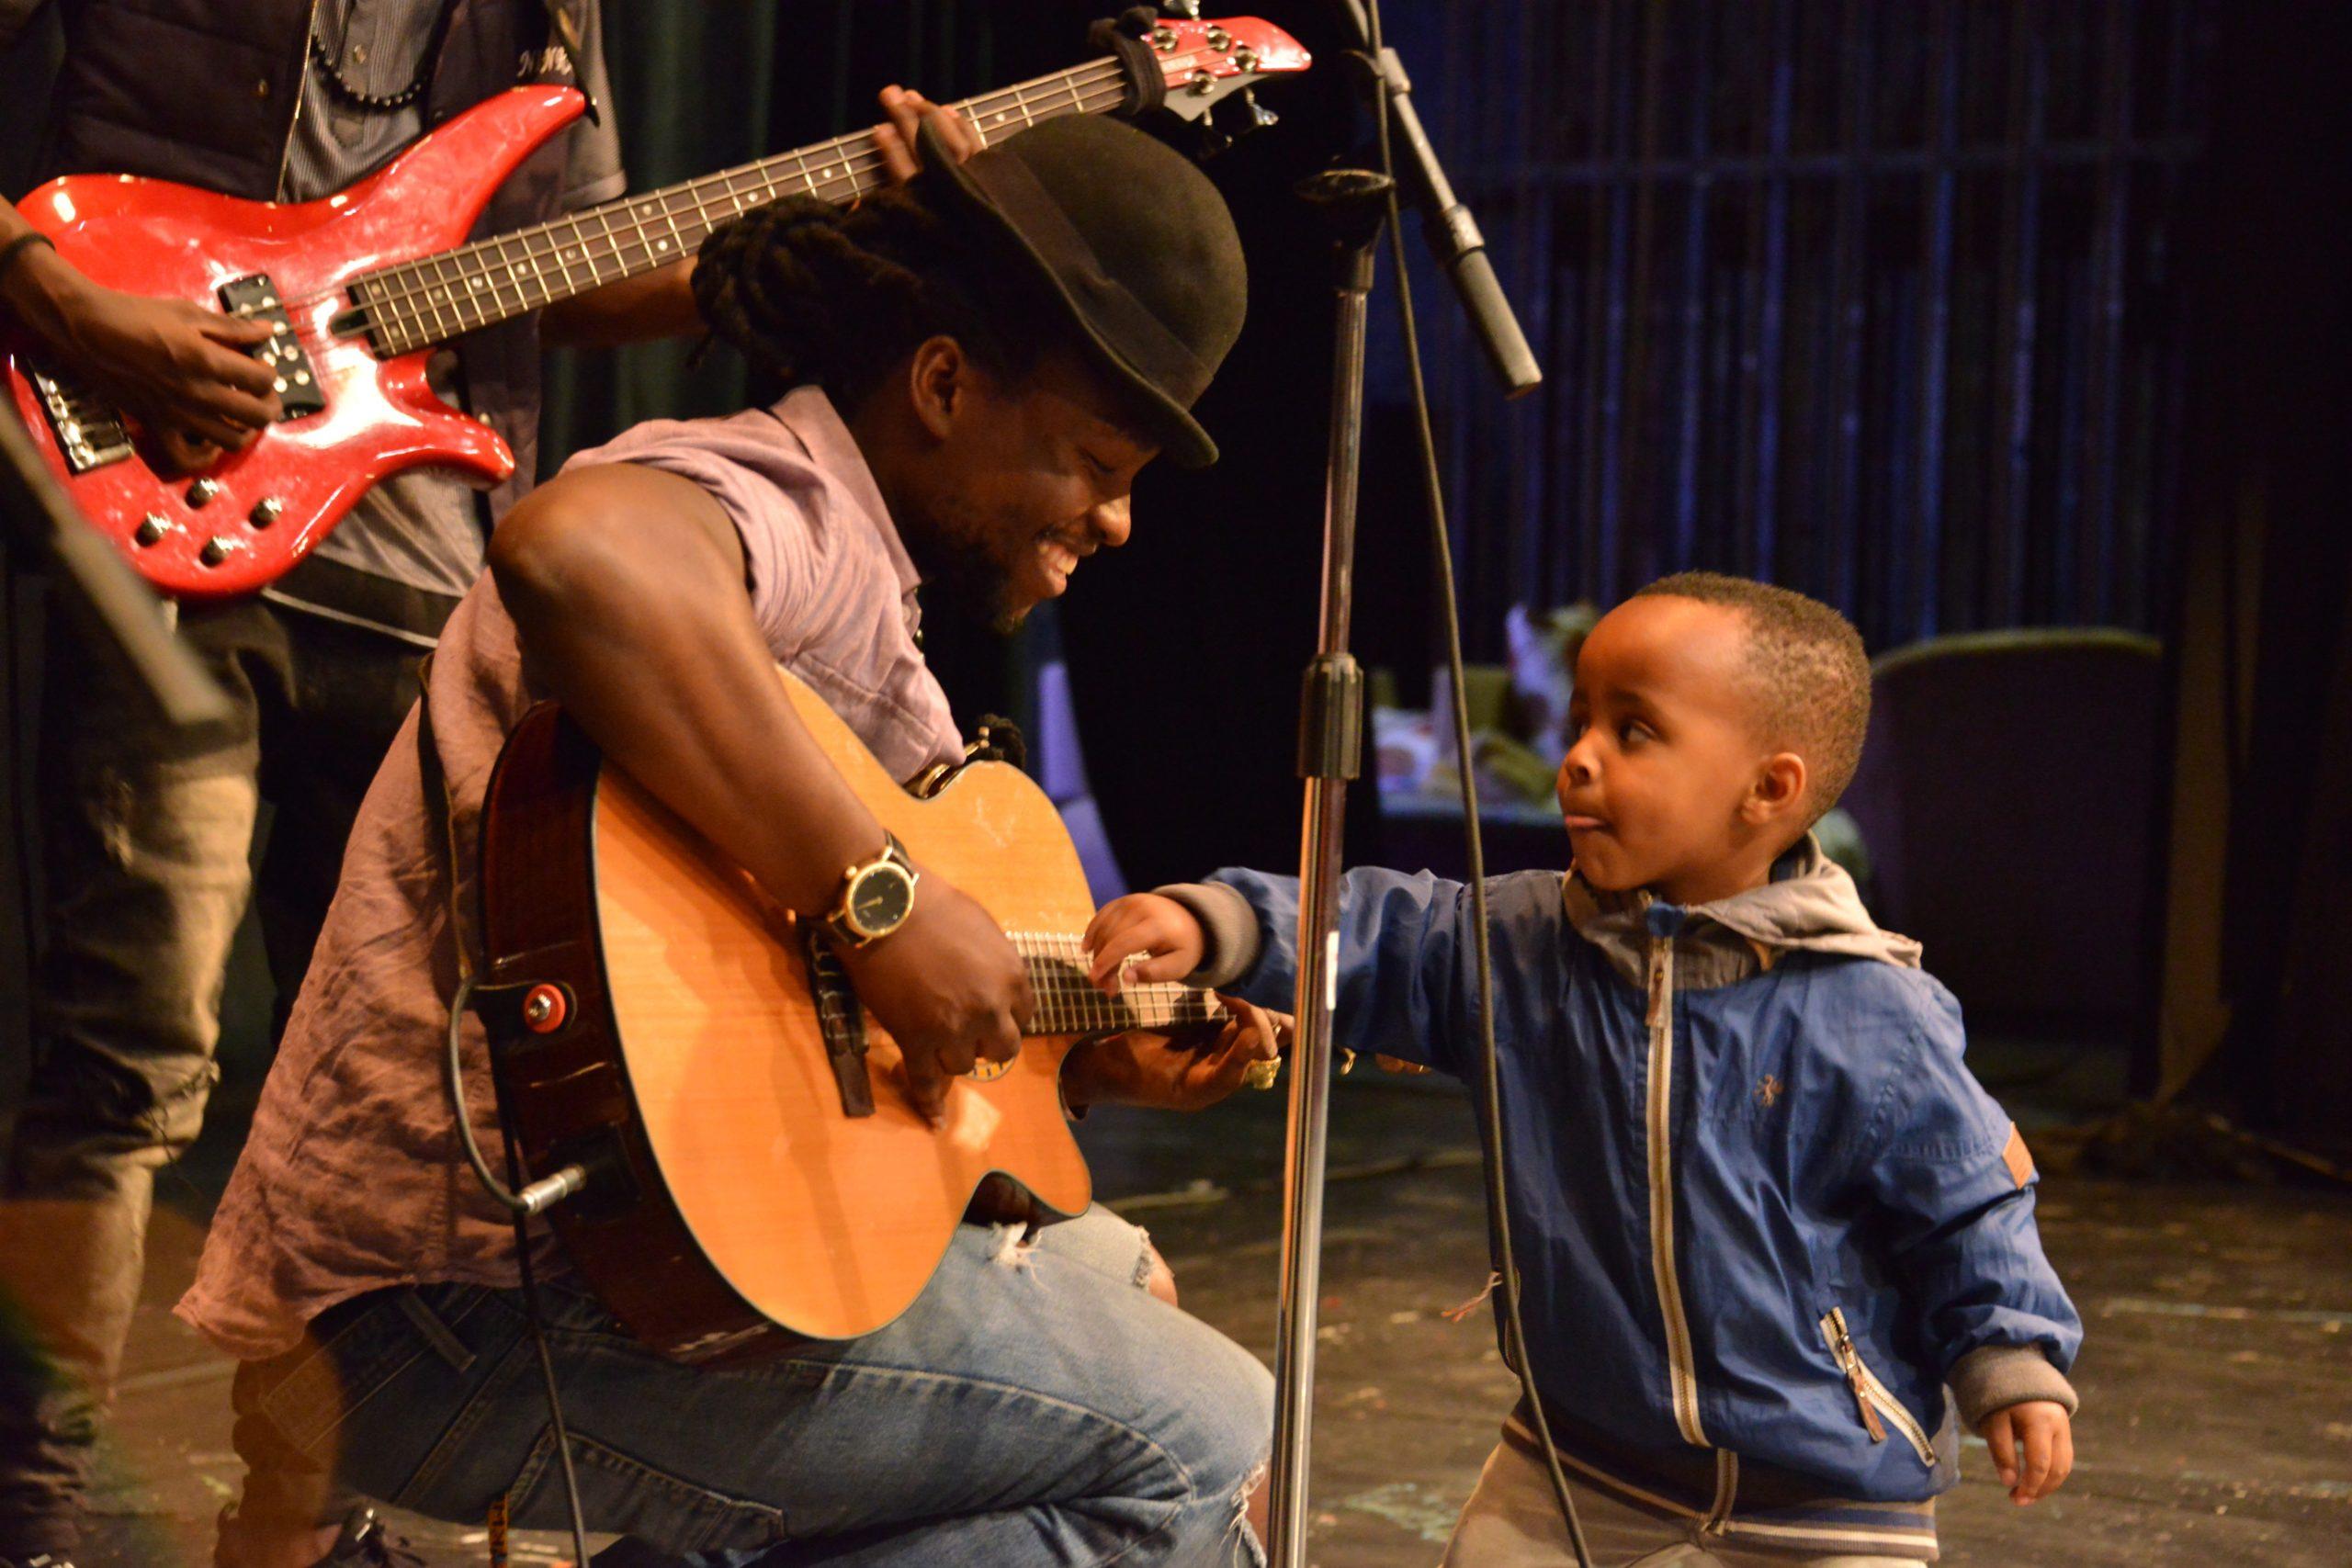 Intergenerational Dialogue Forum on Music